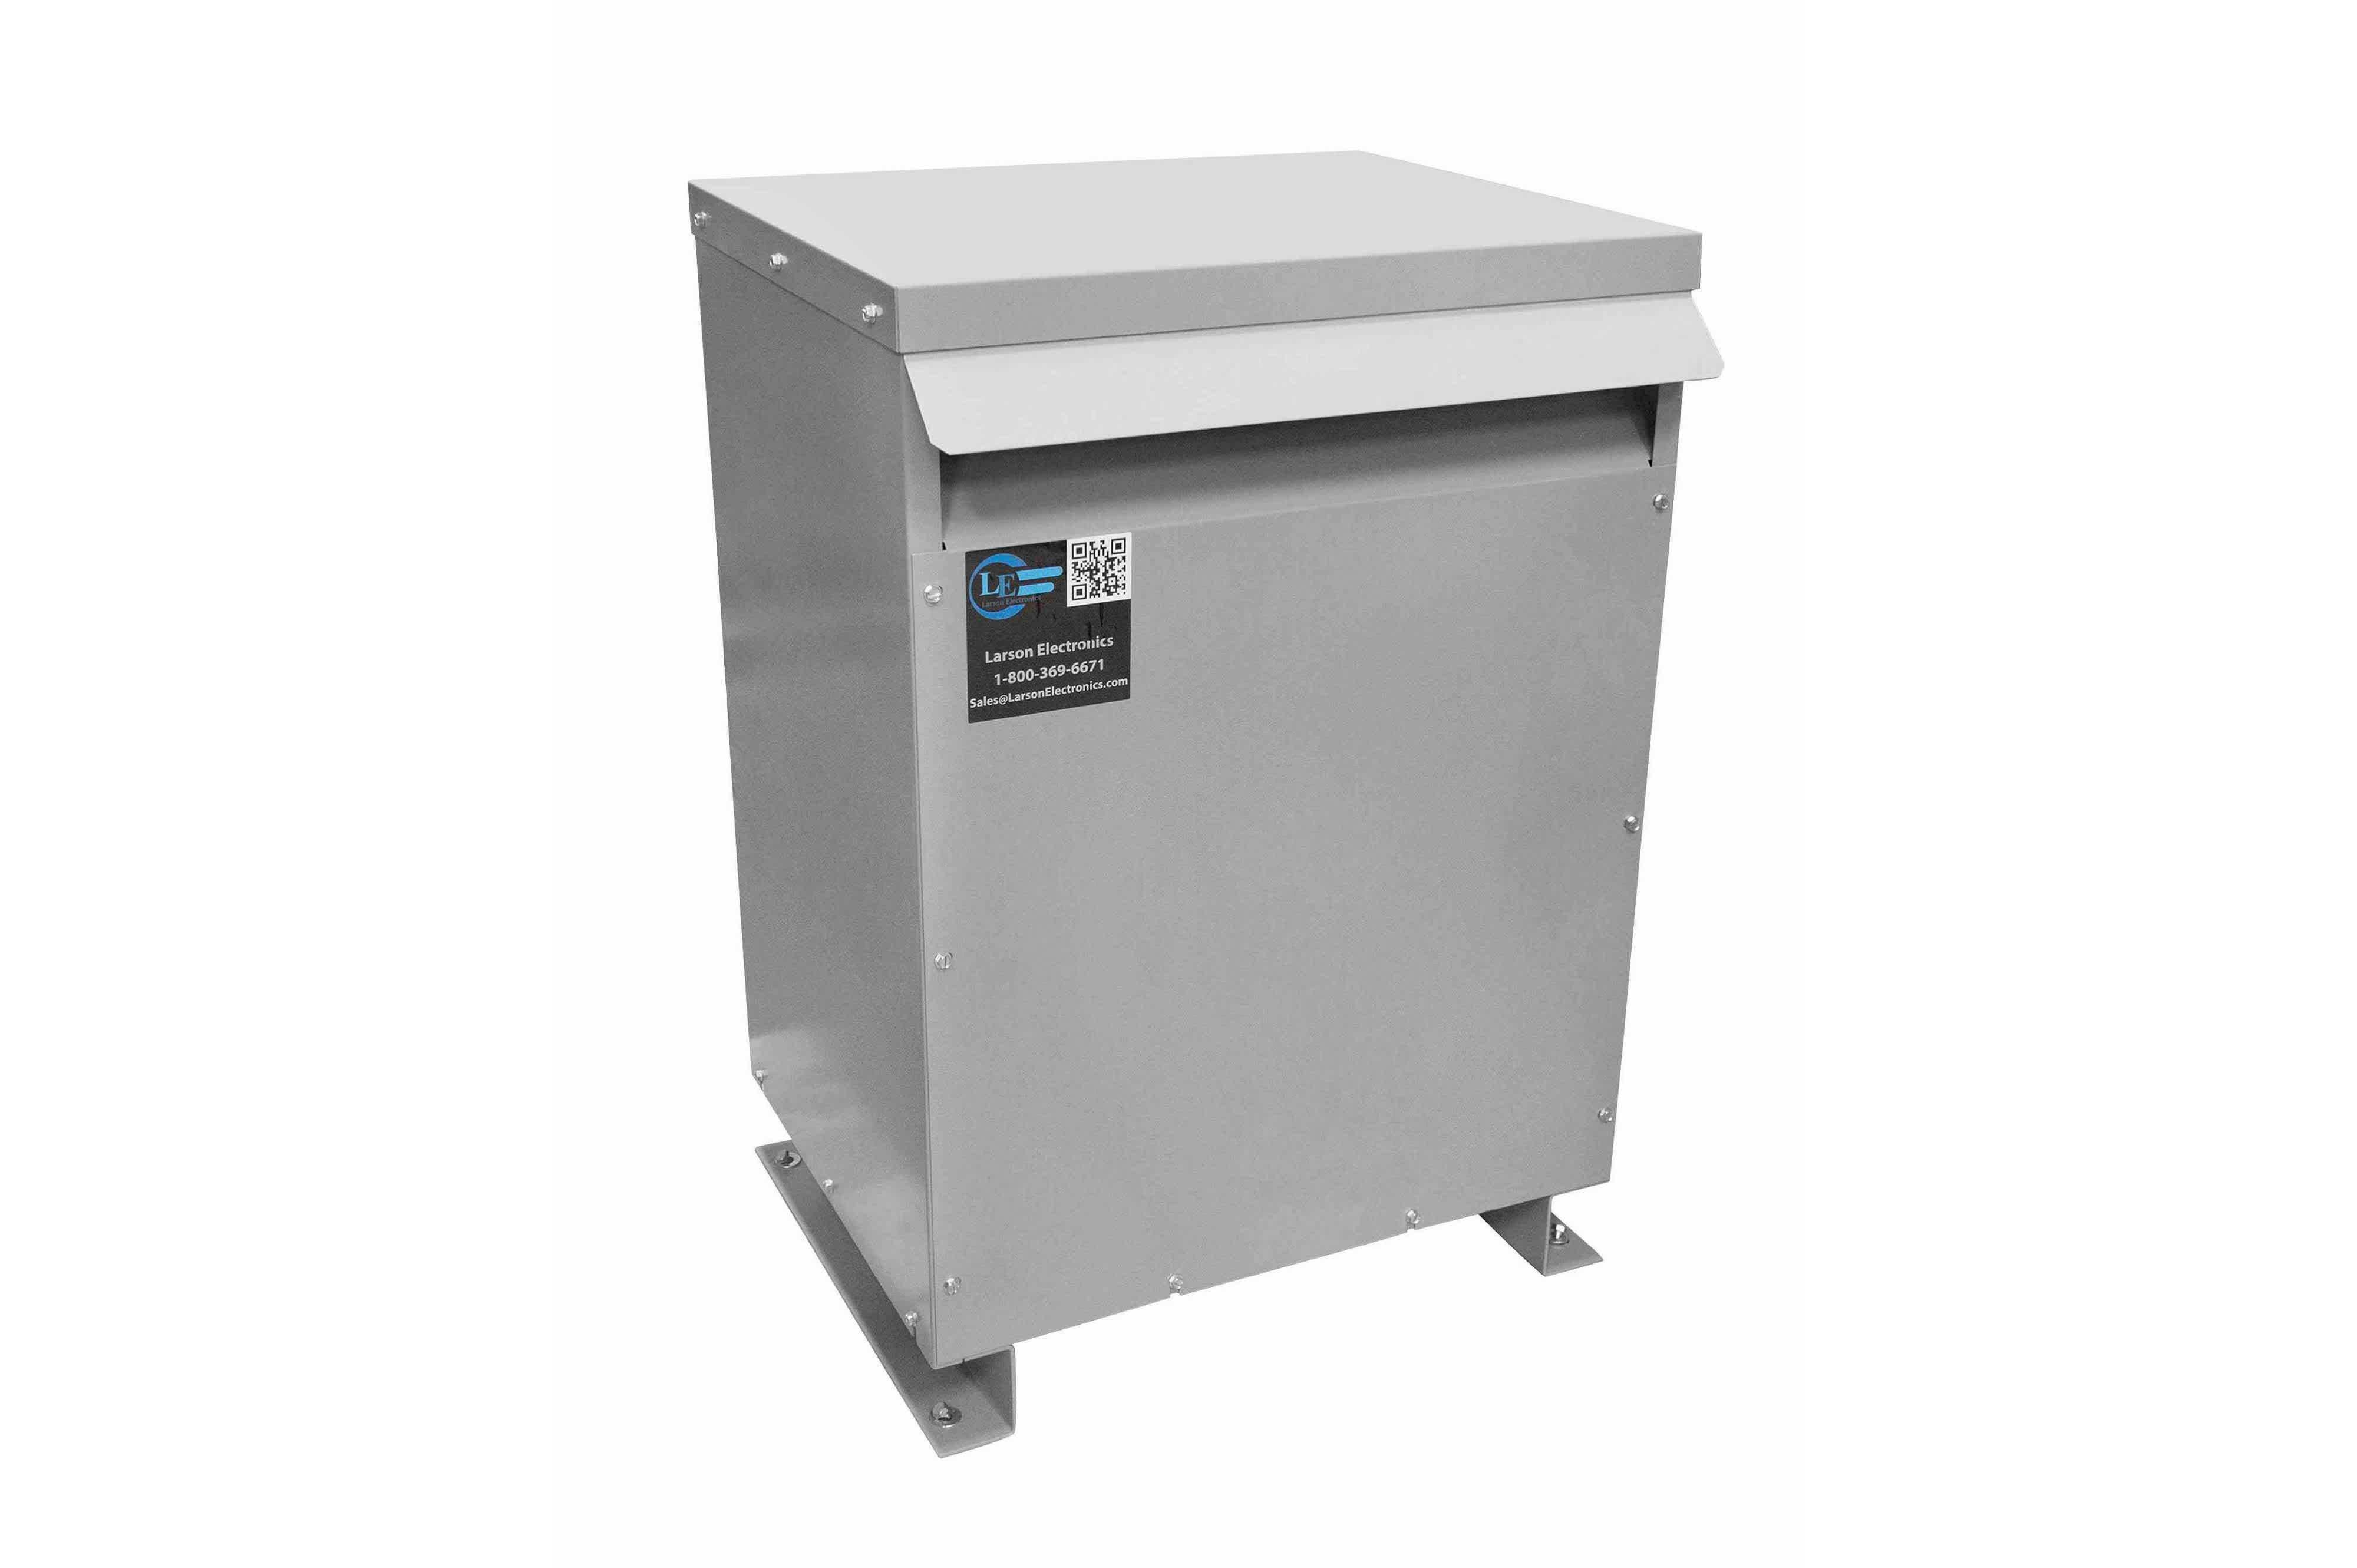 700 kVA 3PH Isolation Transformer, 440V Wye Primary, 208V Delta Secondary, N3R, Ventilated, 60 Hz